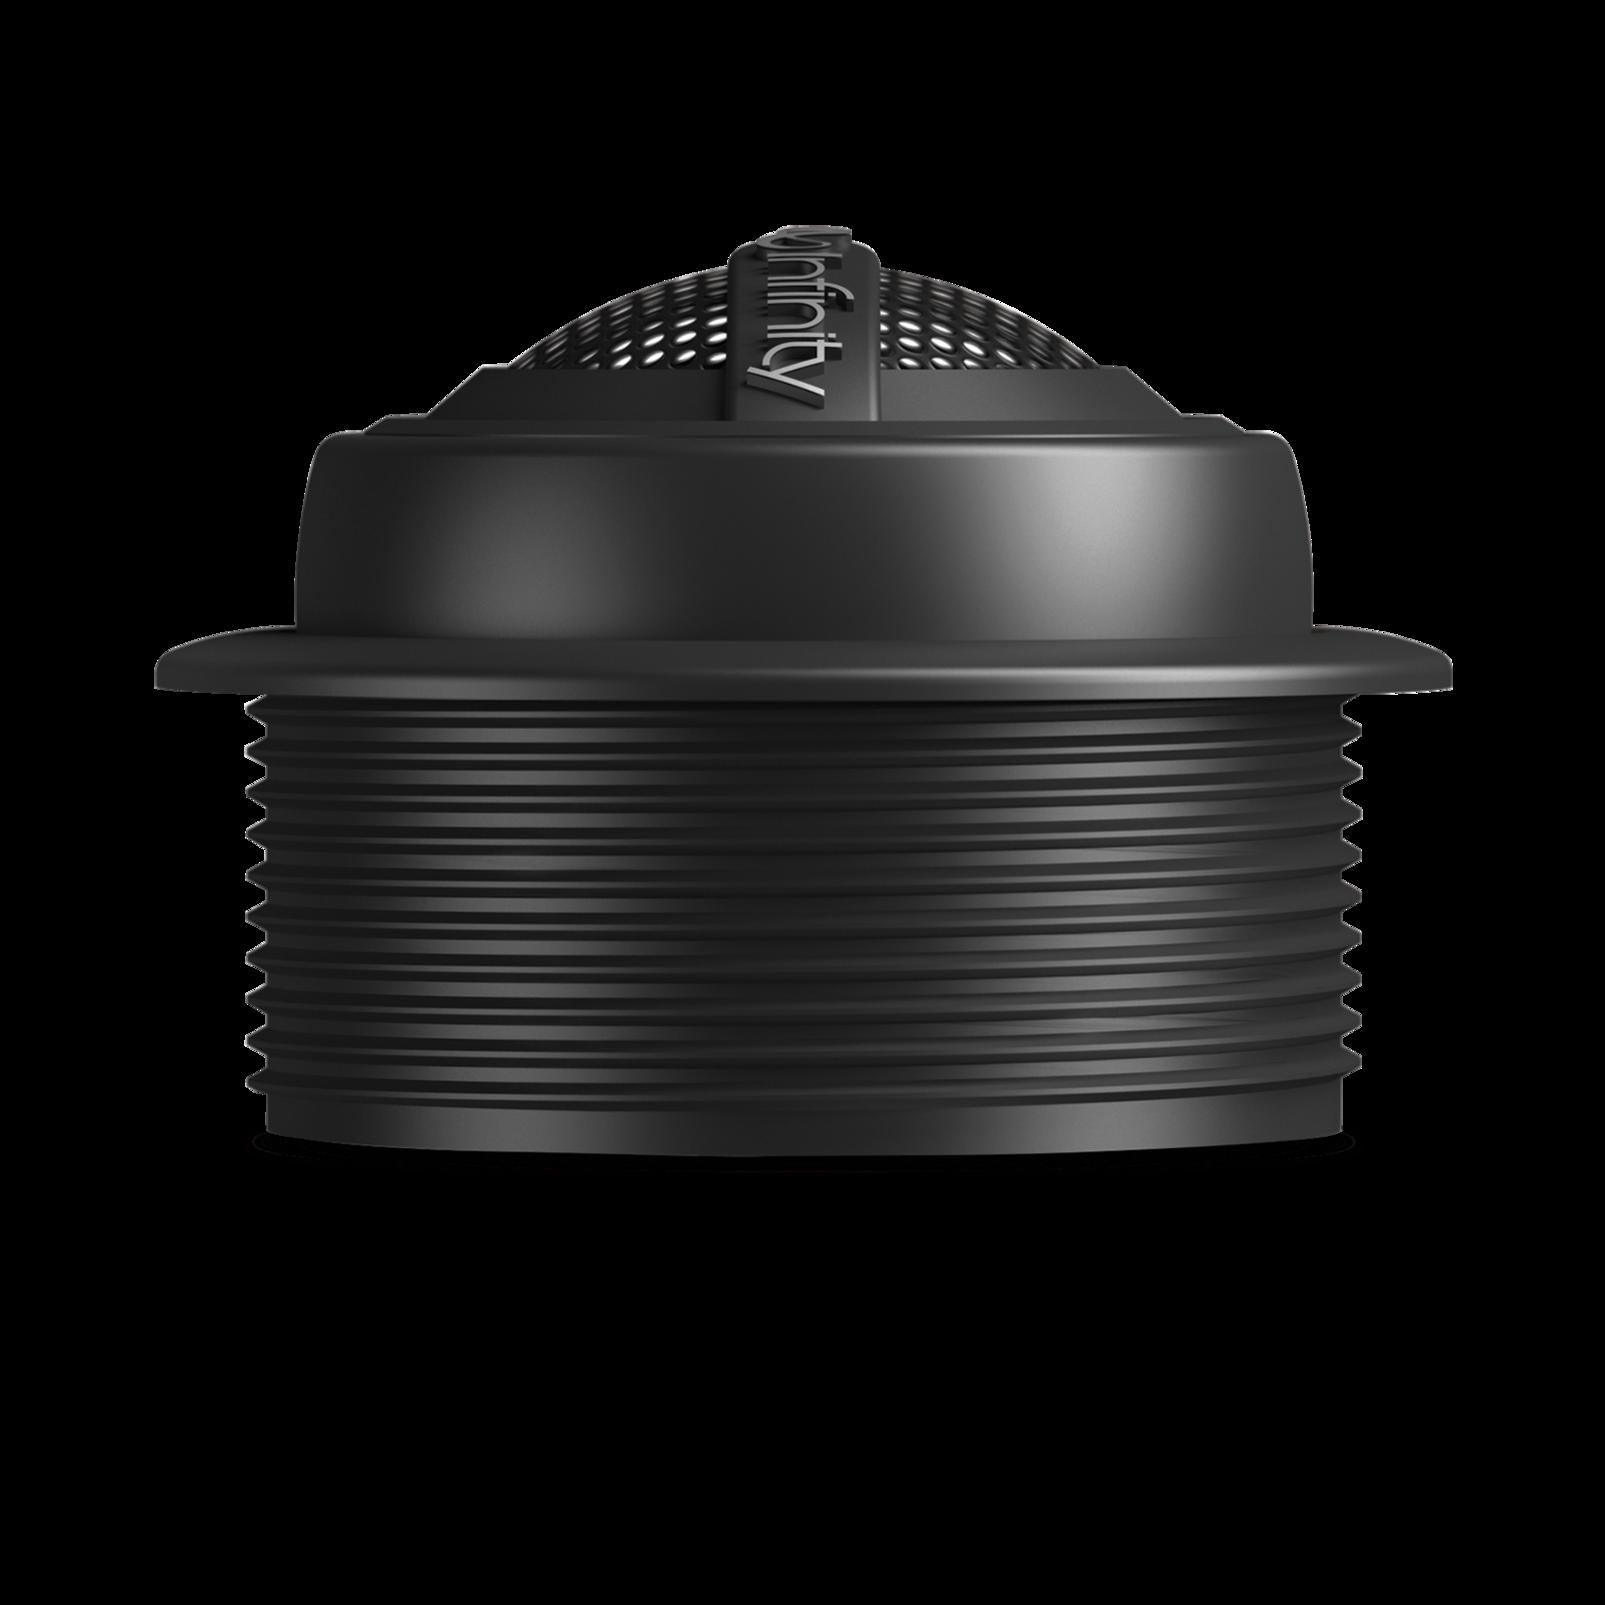 "Kappa 60.11cs - Black - 6-1/2"", two-way, component speaker system - Detailshot 2"